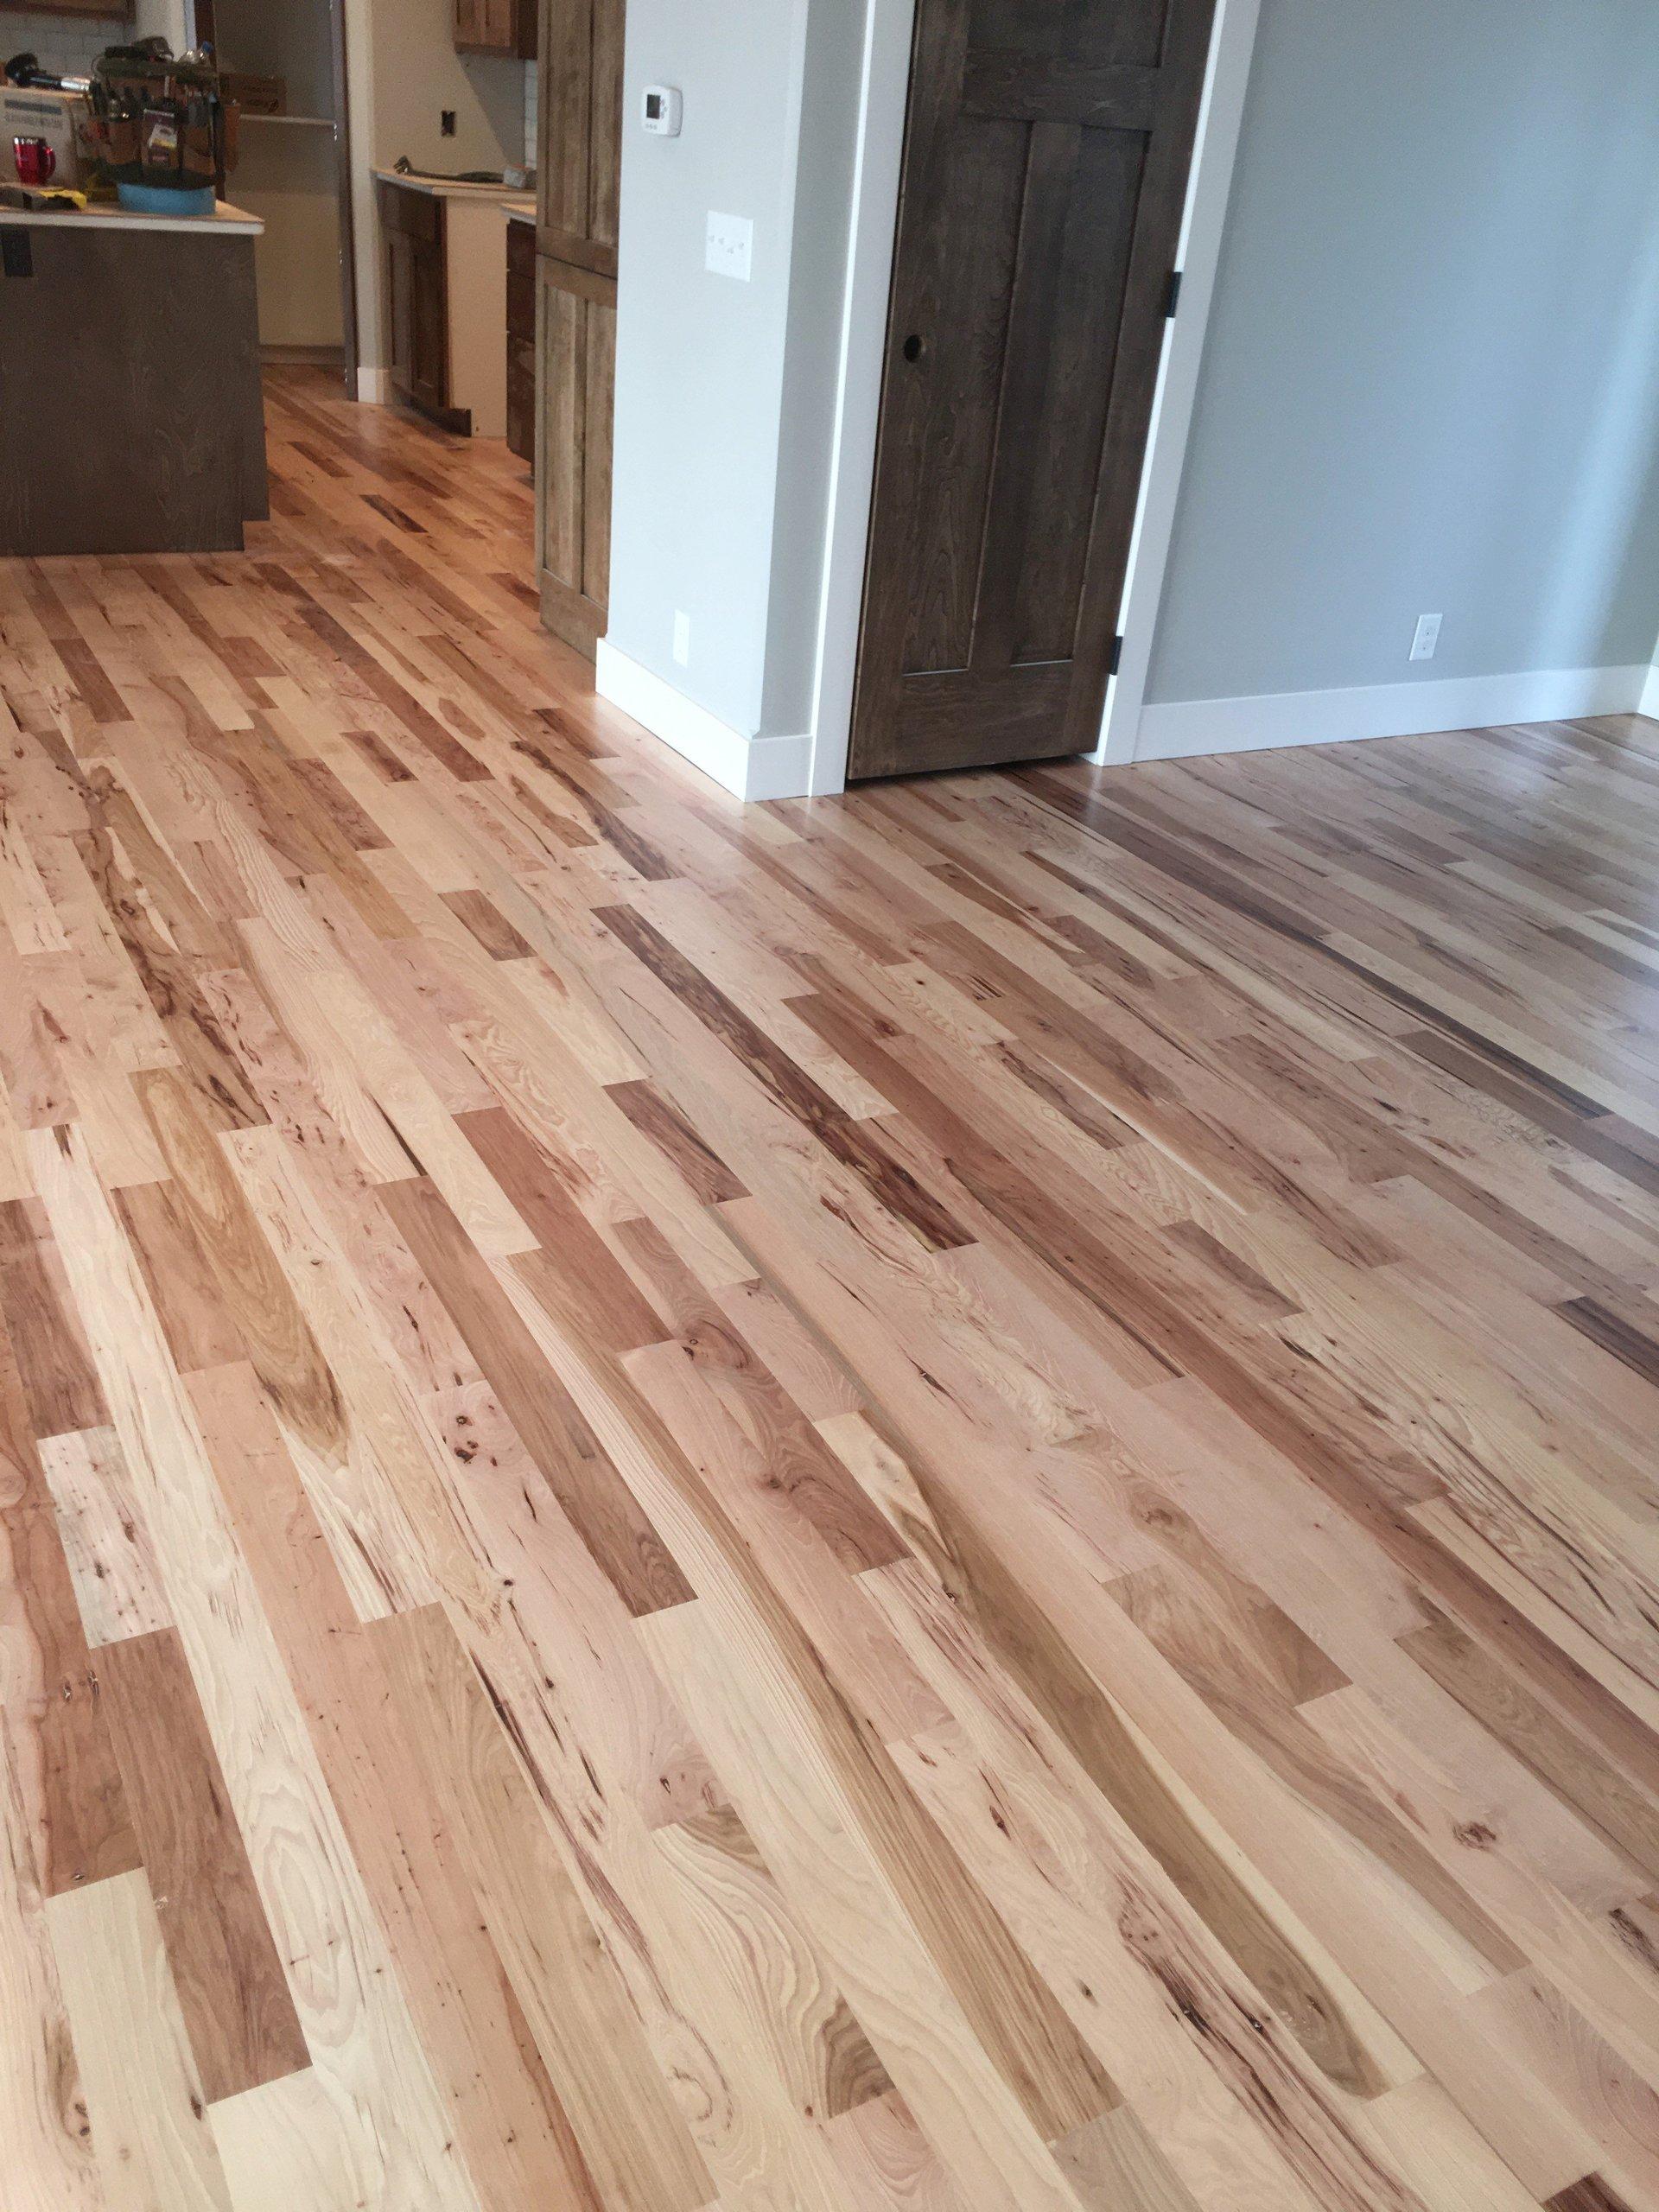 llc image free contractors polishing services marble header flooring floor estimates quality